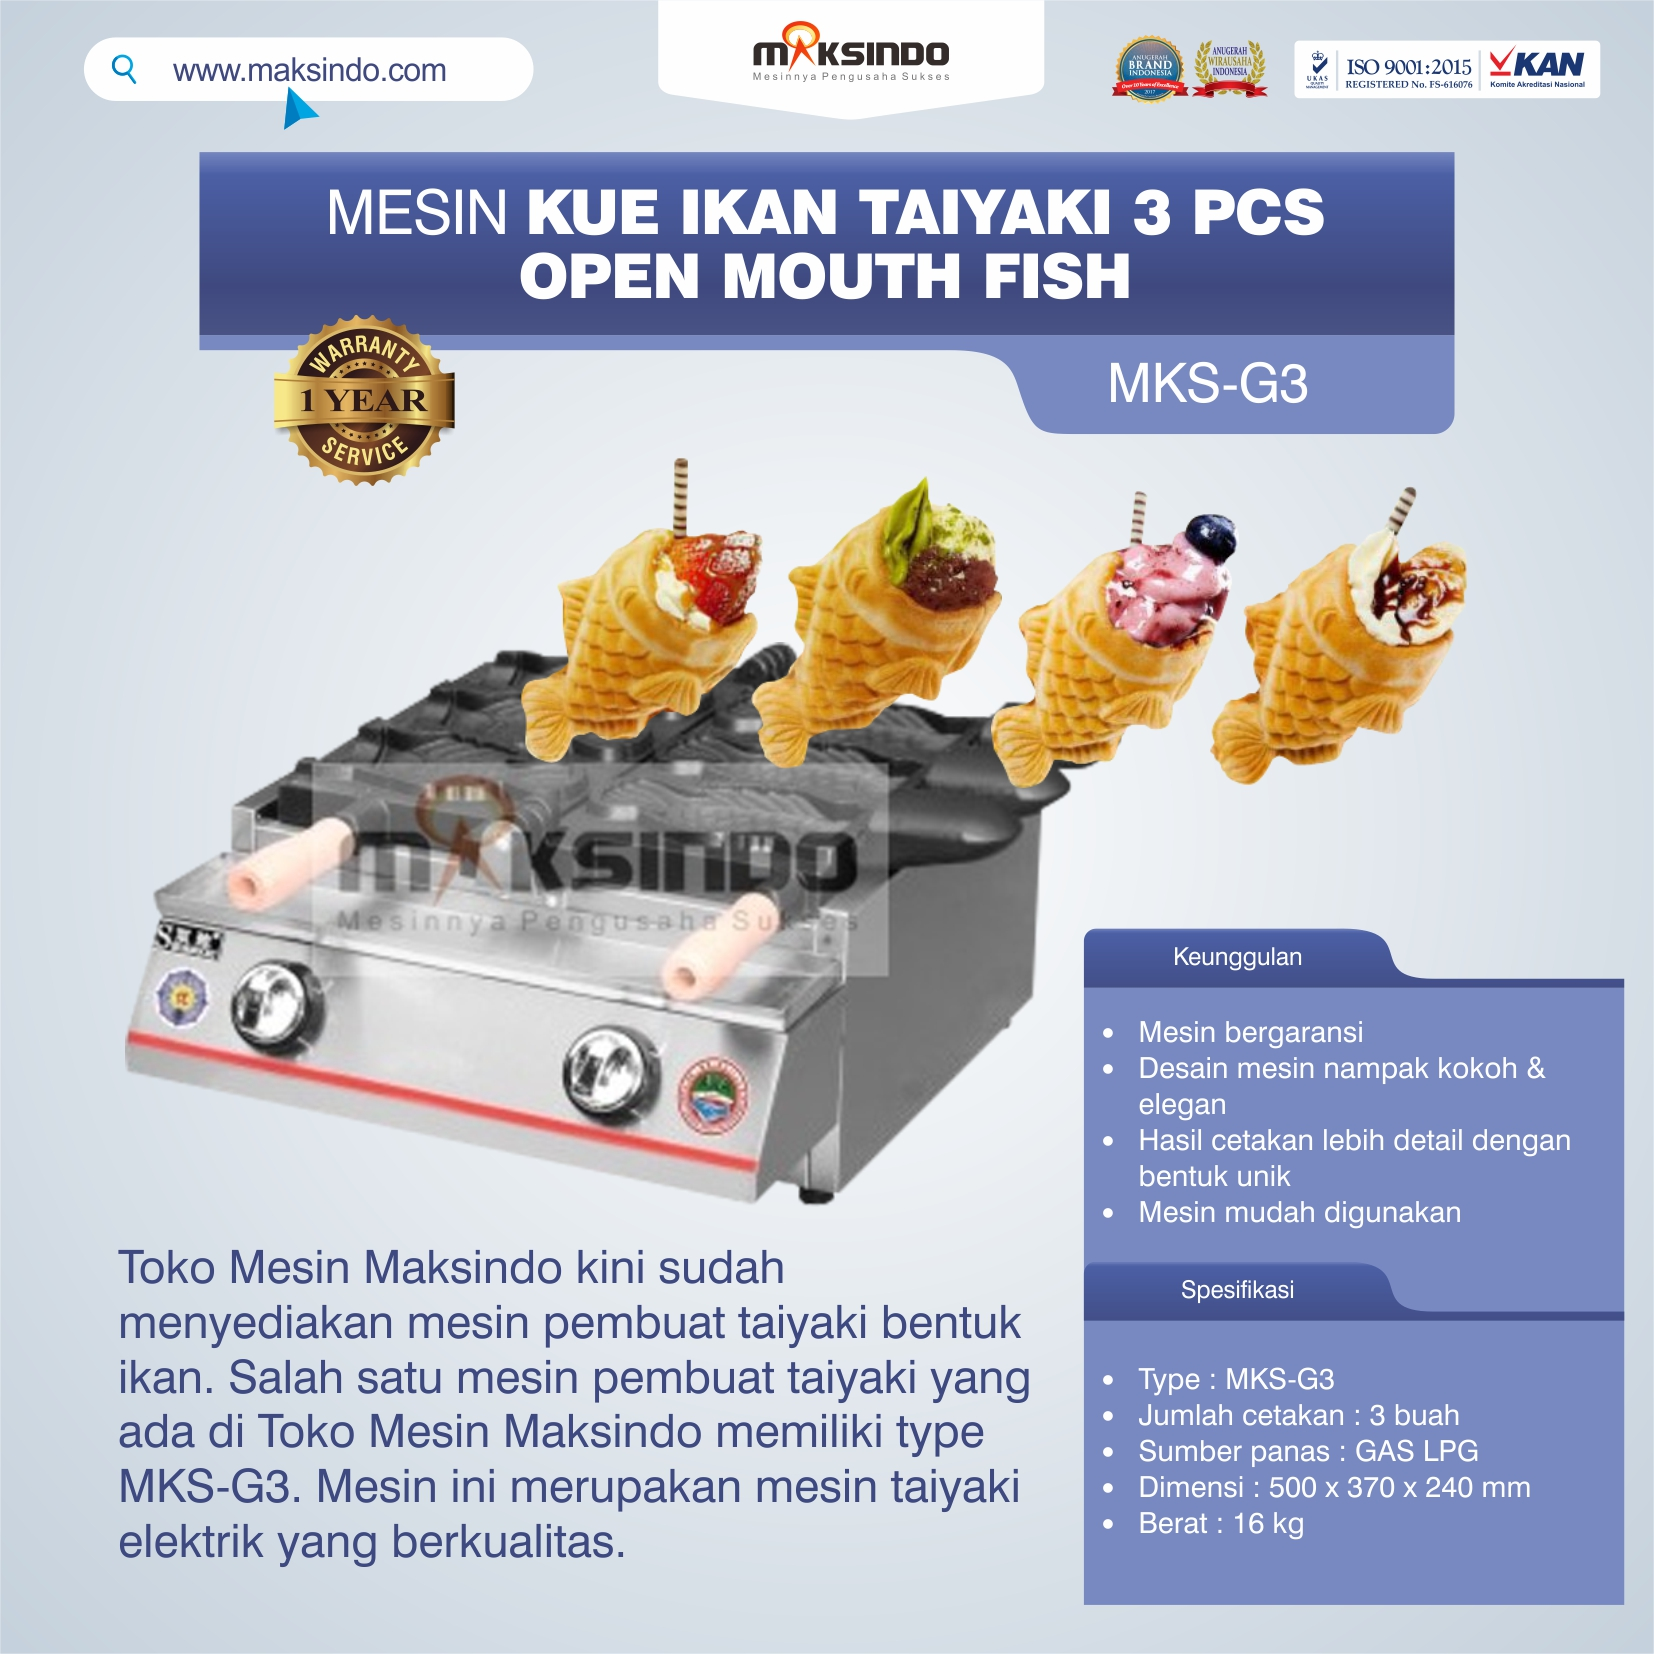 Jual Mesin Kue Ikan Taiyaki (3 pcs) – Open Mouth Fish di Makassar